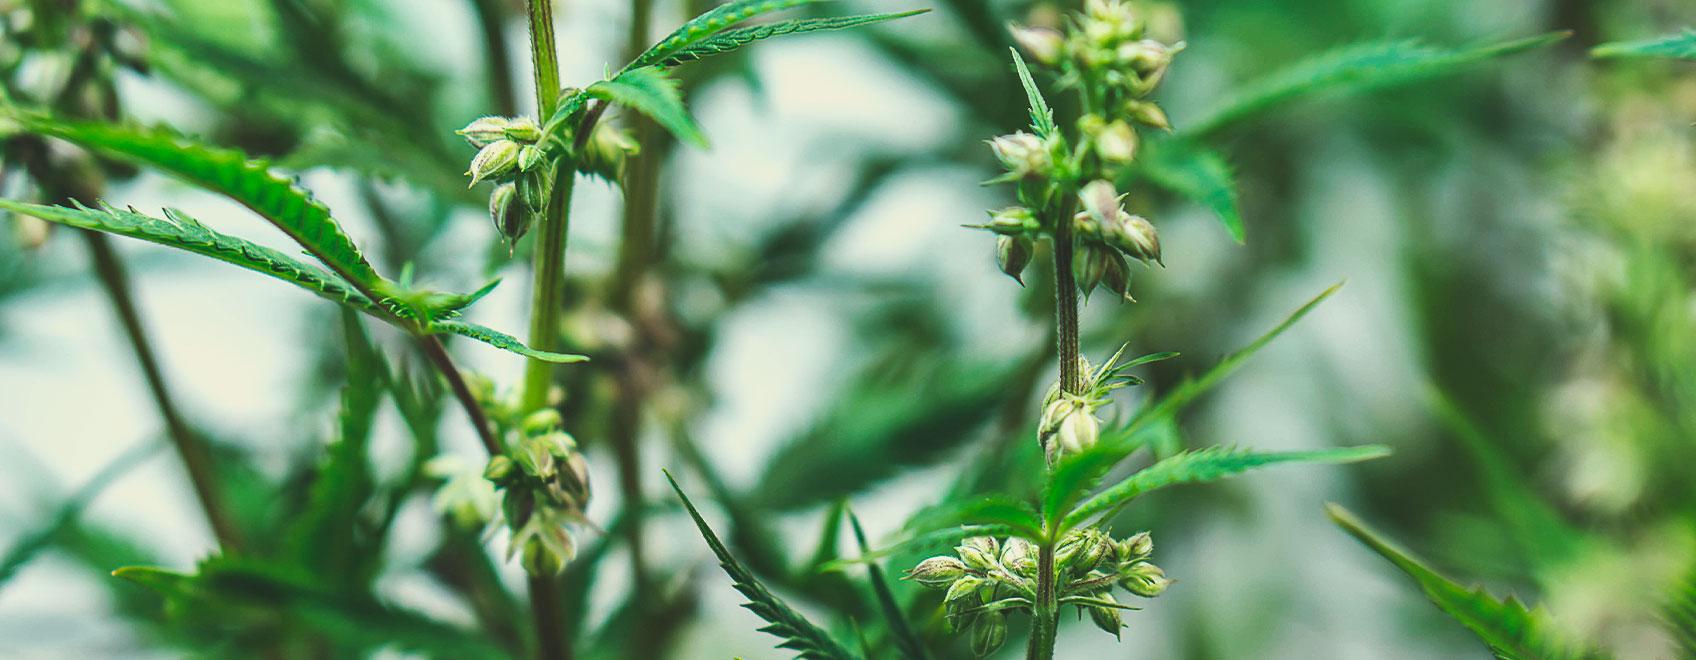 Medical cannabis seeds